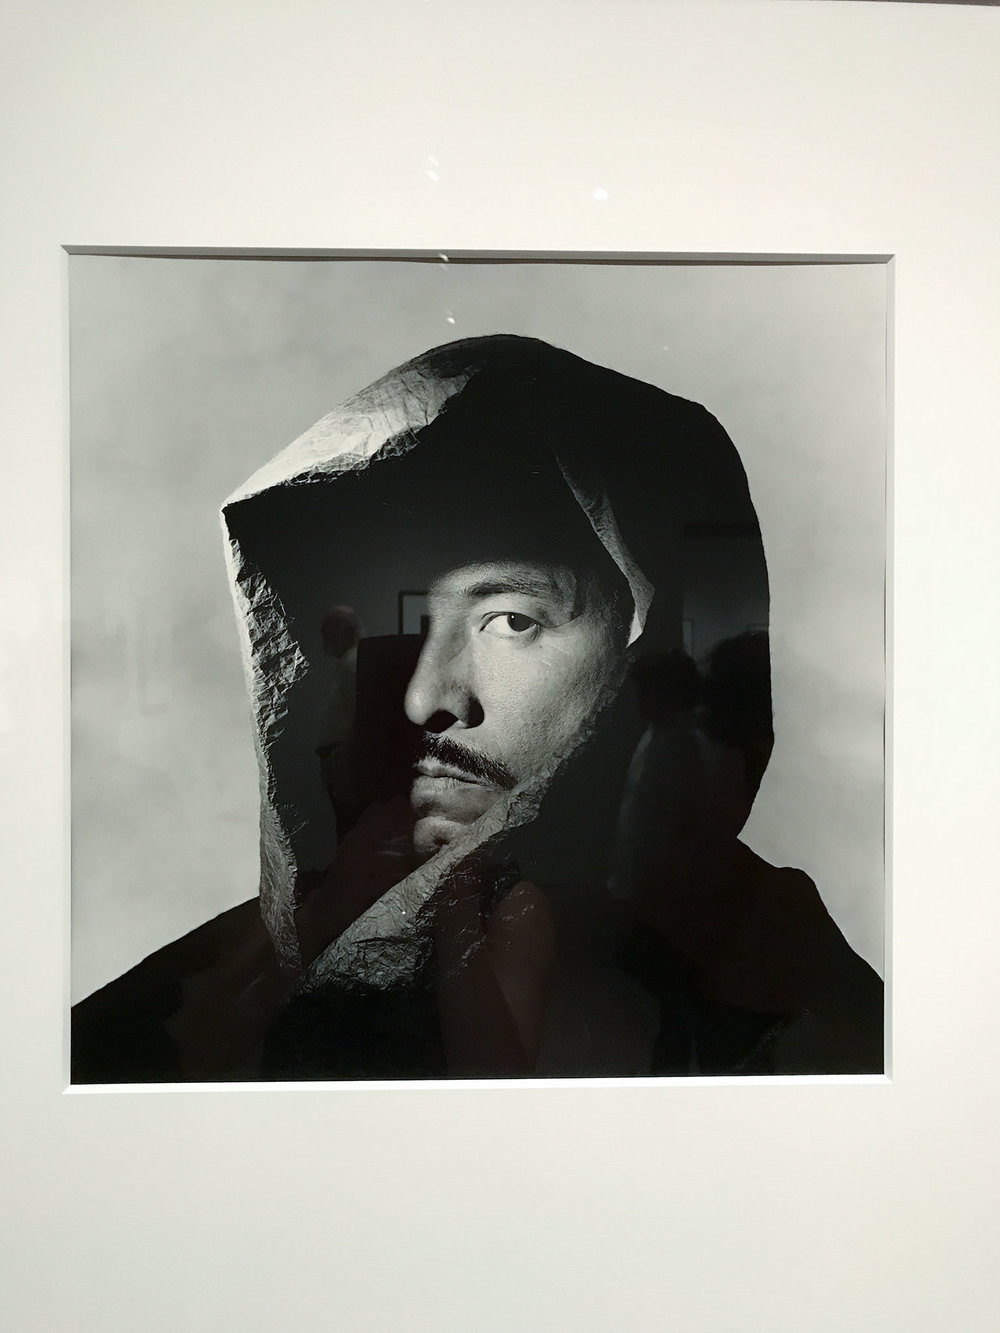 Issey Miyake (fashion designer)